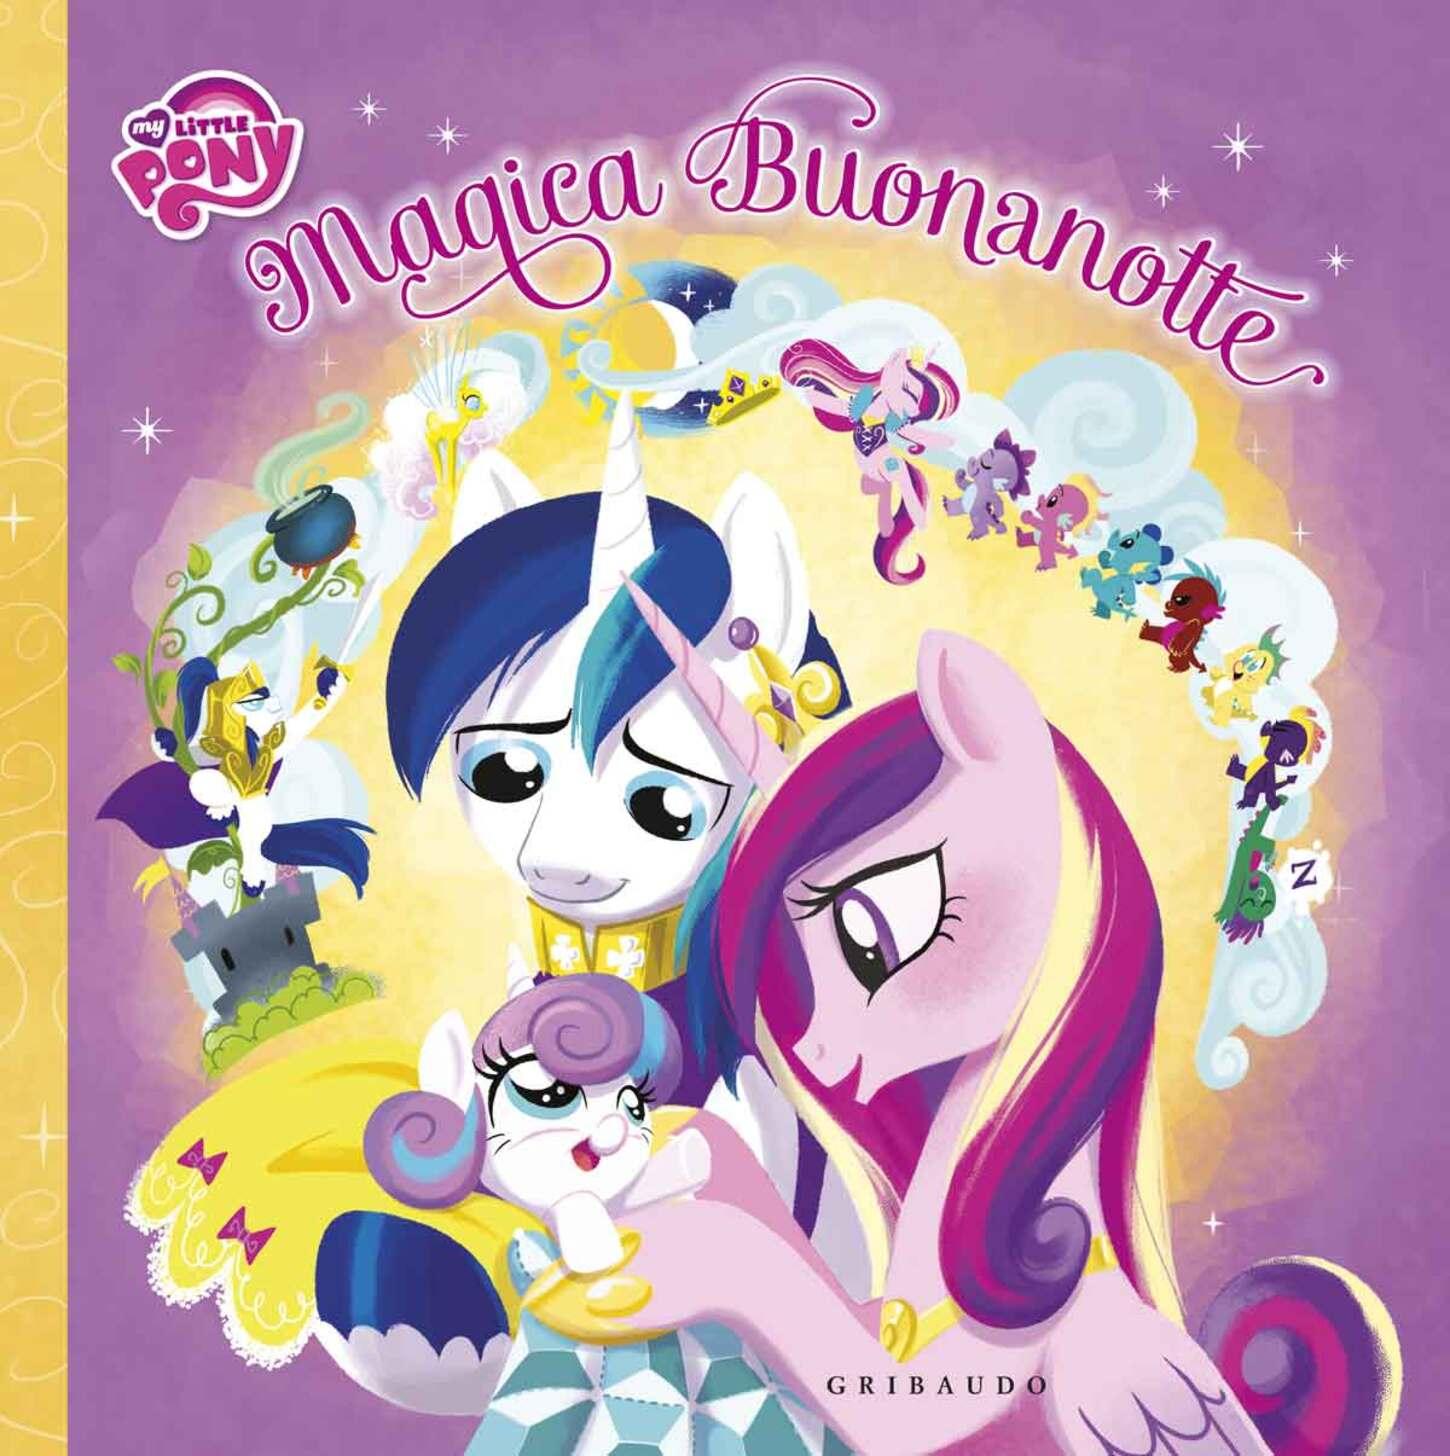 Magica Buonanotte My Little Pony